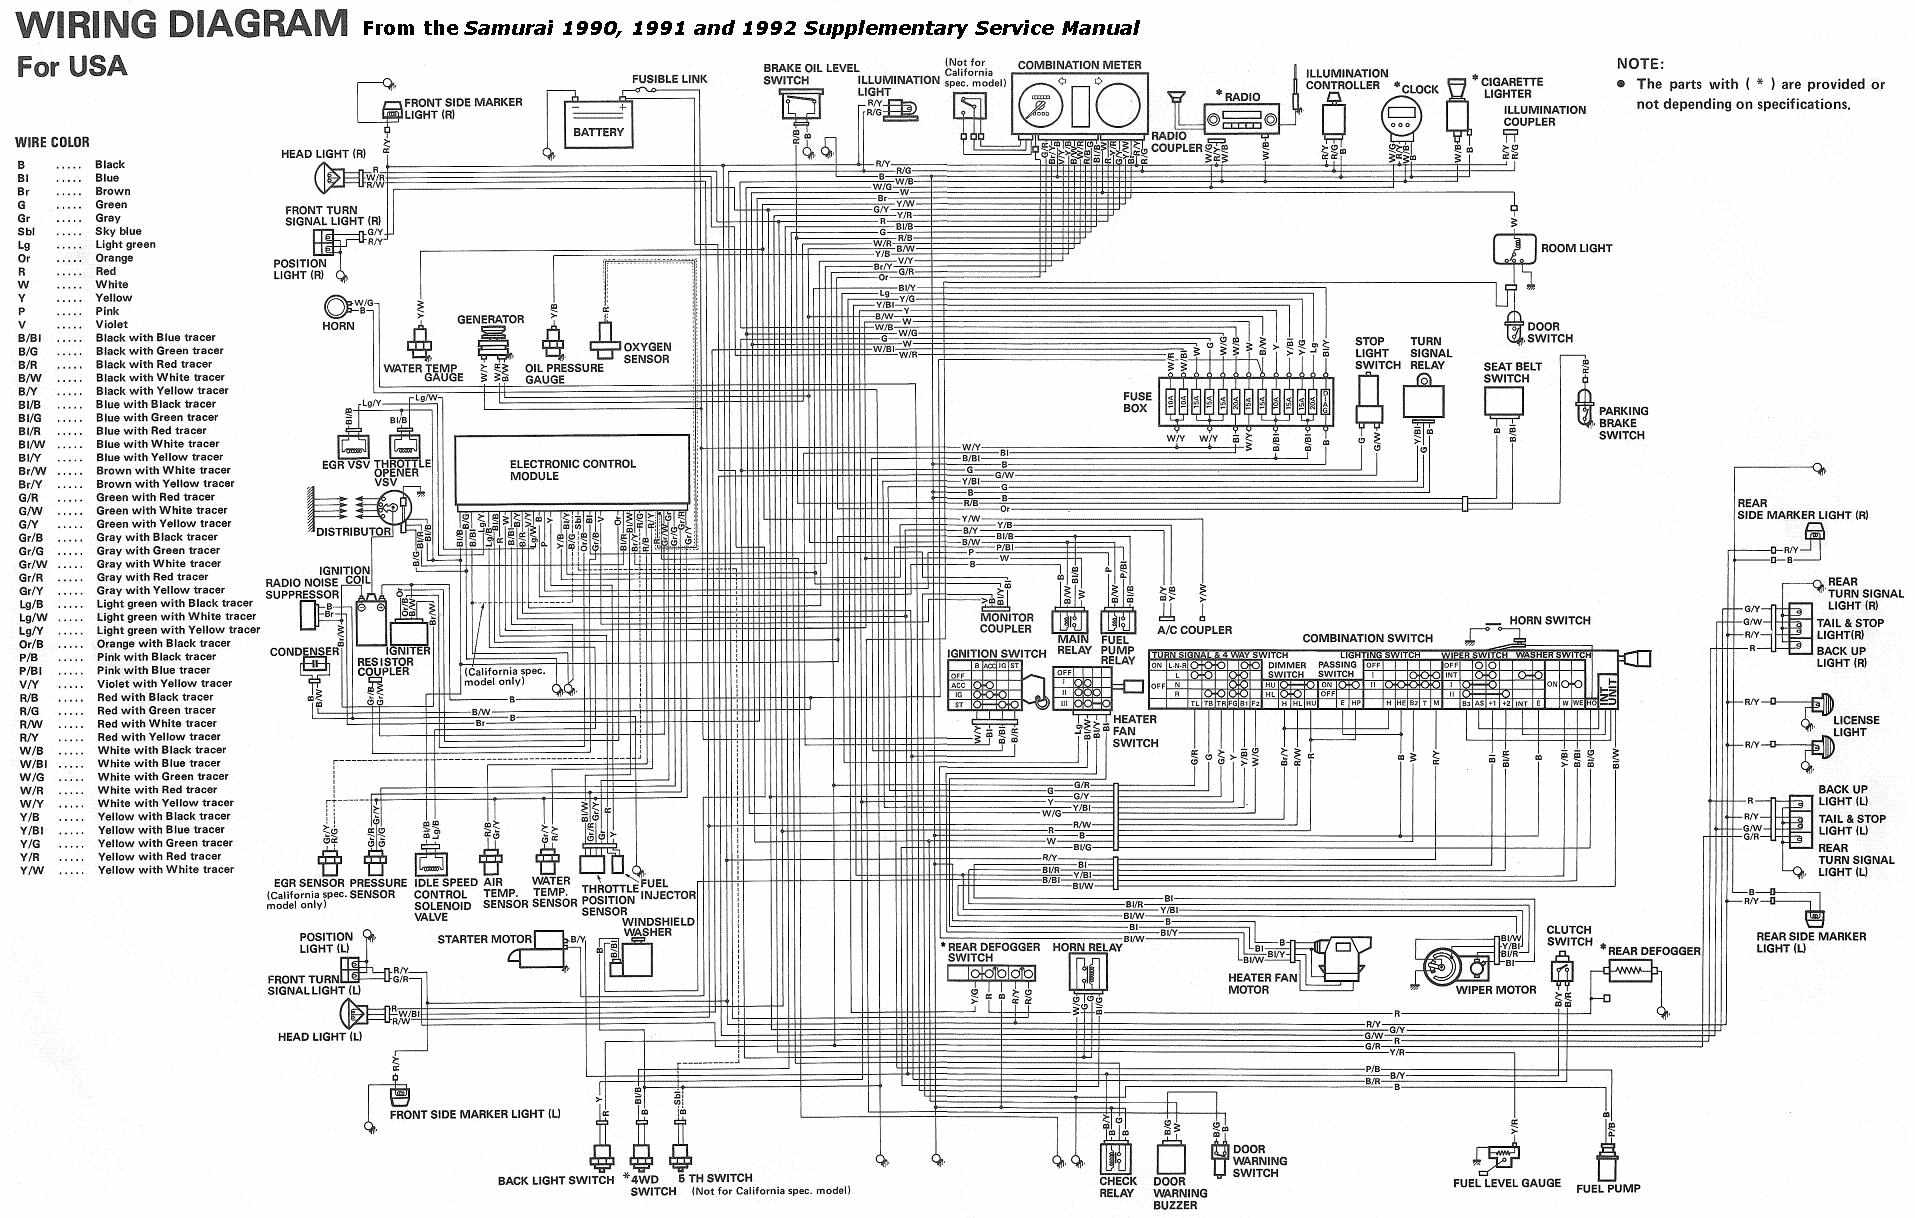 hight resolution of subaru sambar wiring diagram wiring diagram g9 subaru stereo wiring harness diagram subaru sambar wiring diagram